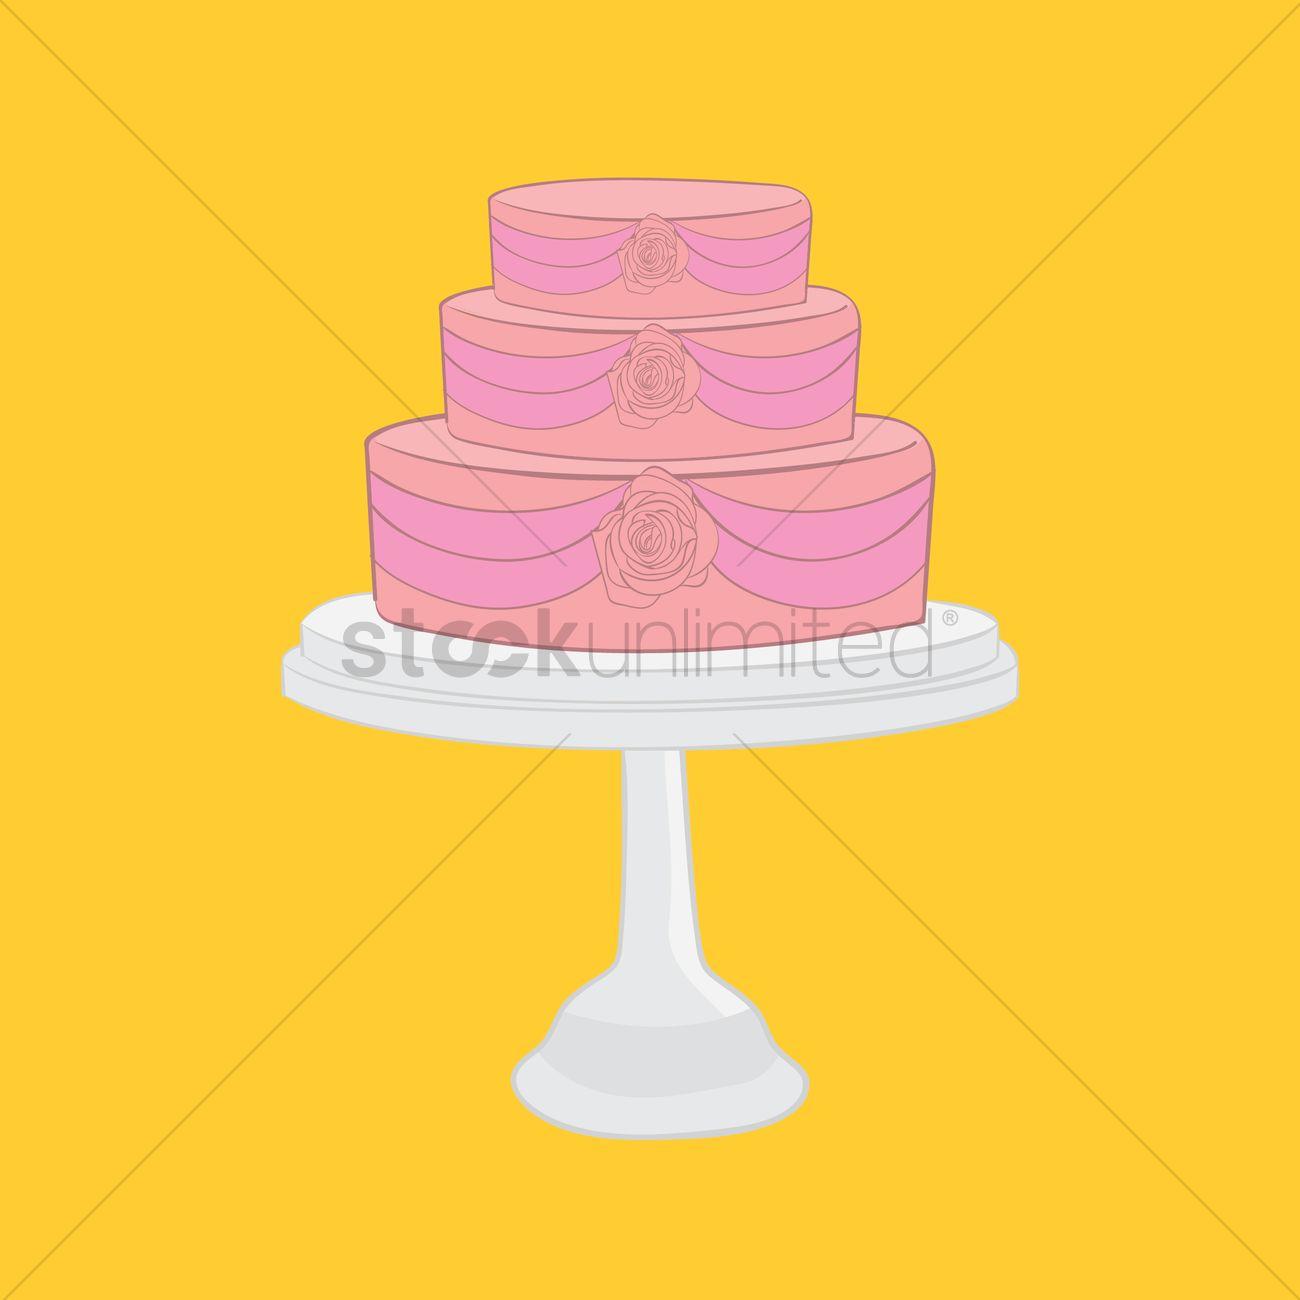 Wedding cake Vector Image - 1333724 | StockUnlimited